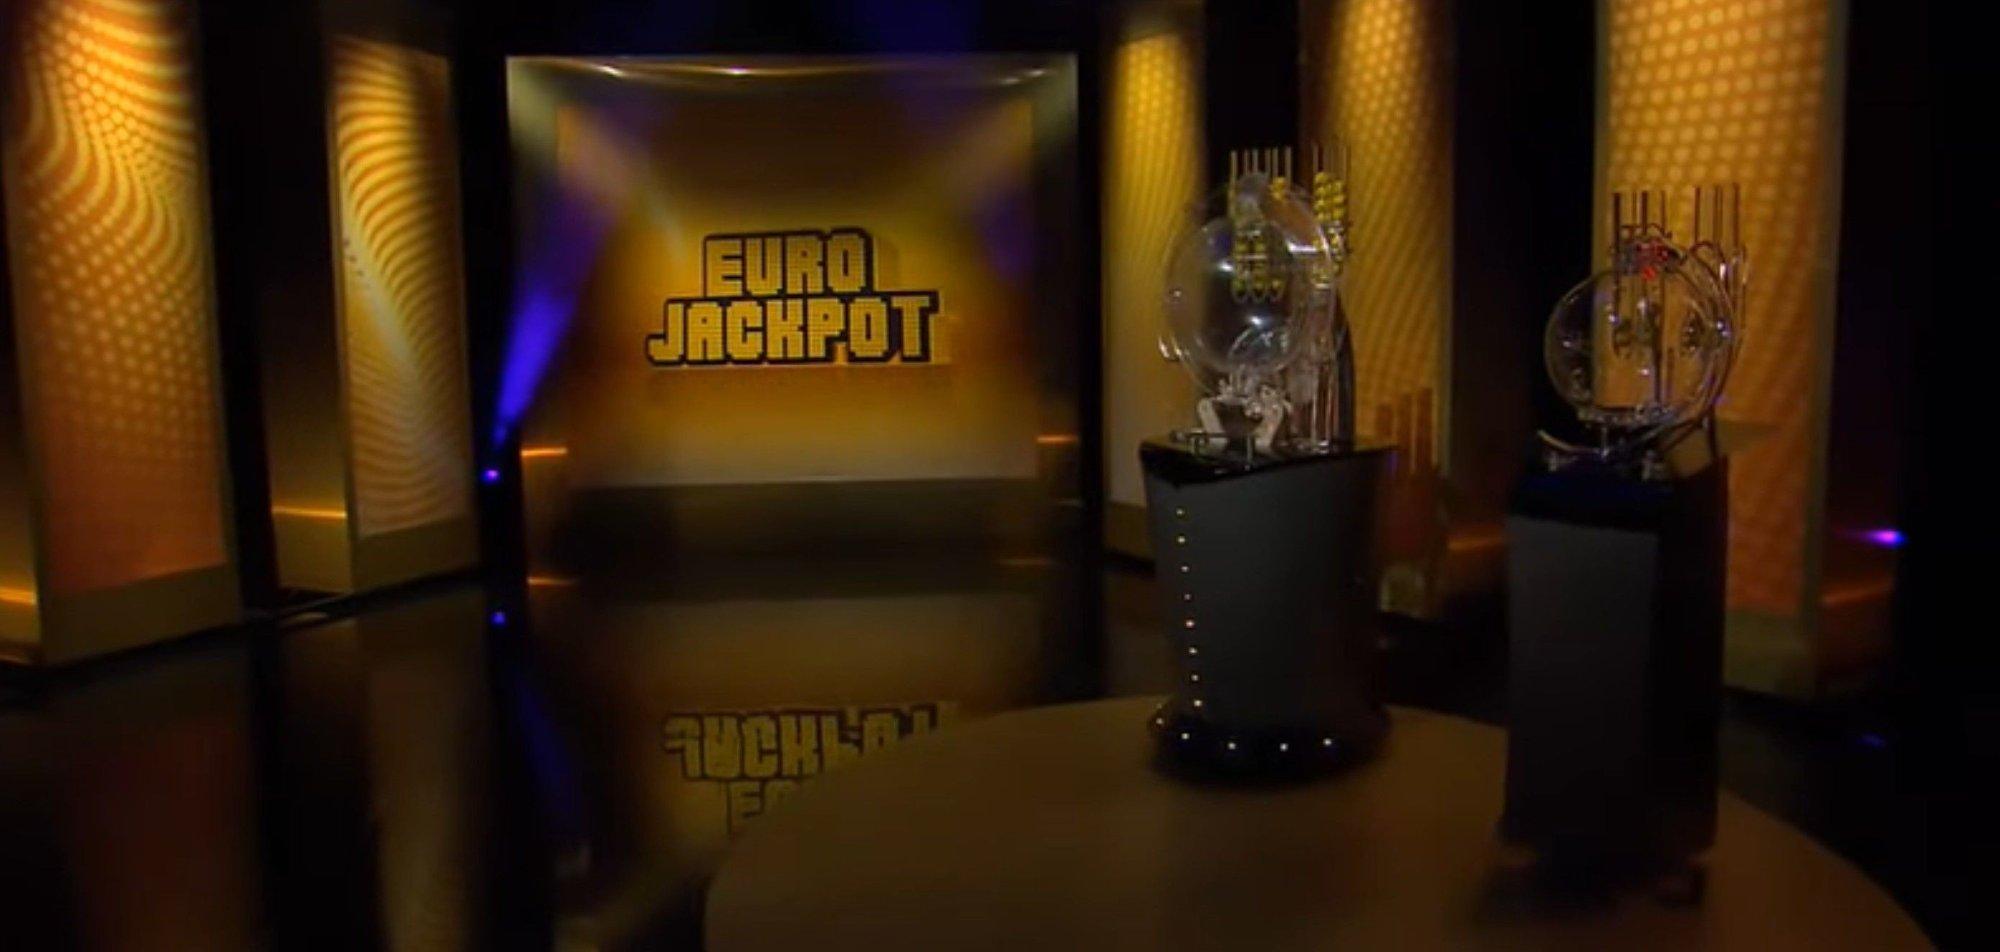 Eurojackpot 01.05.20